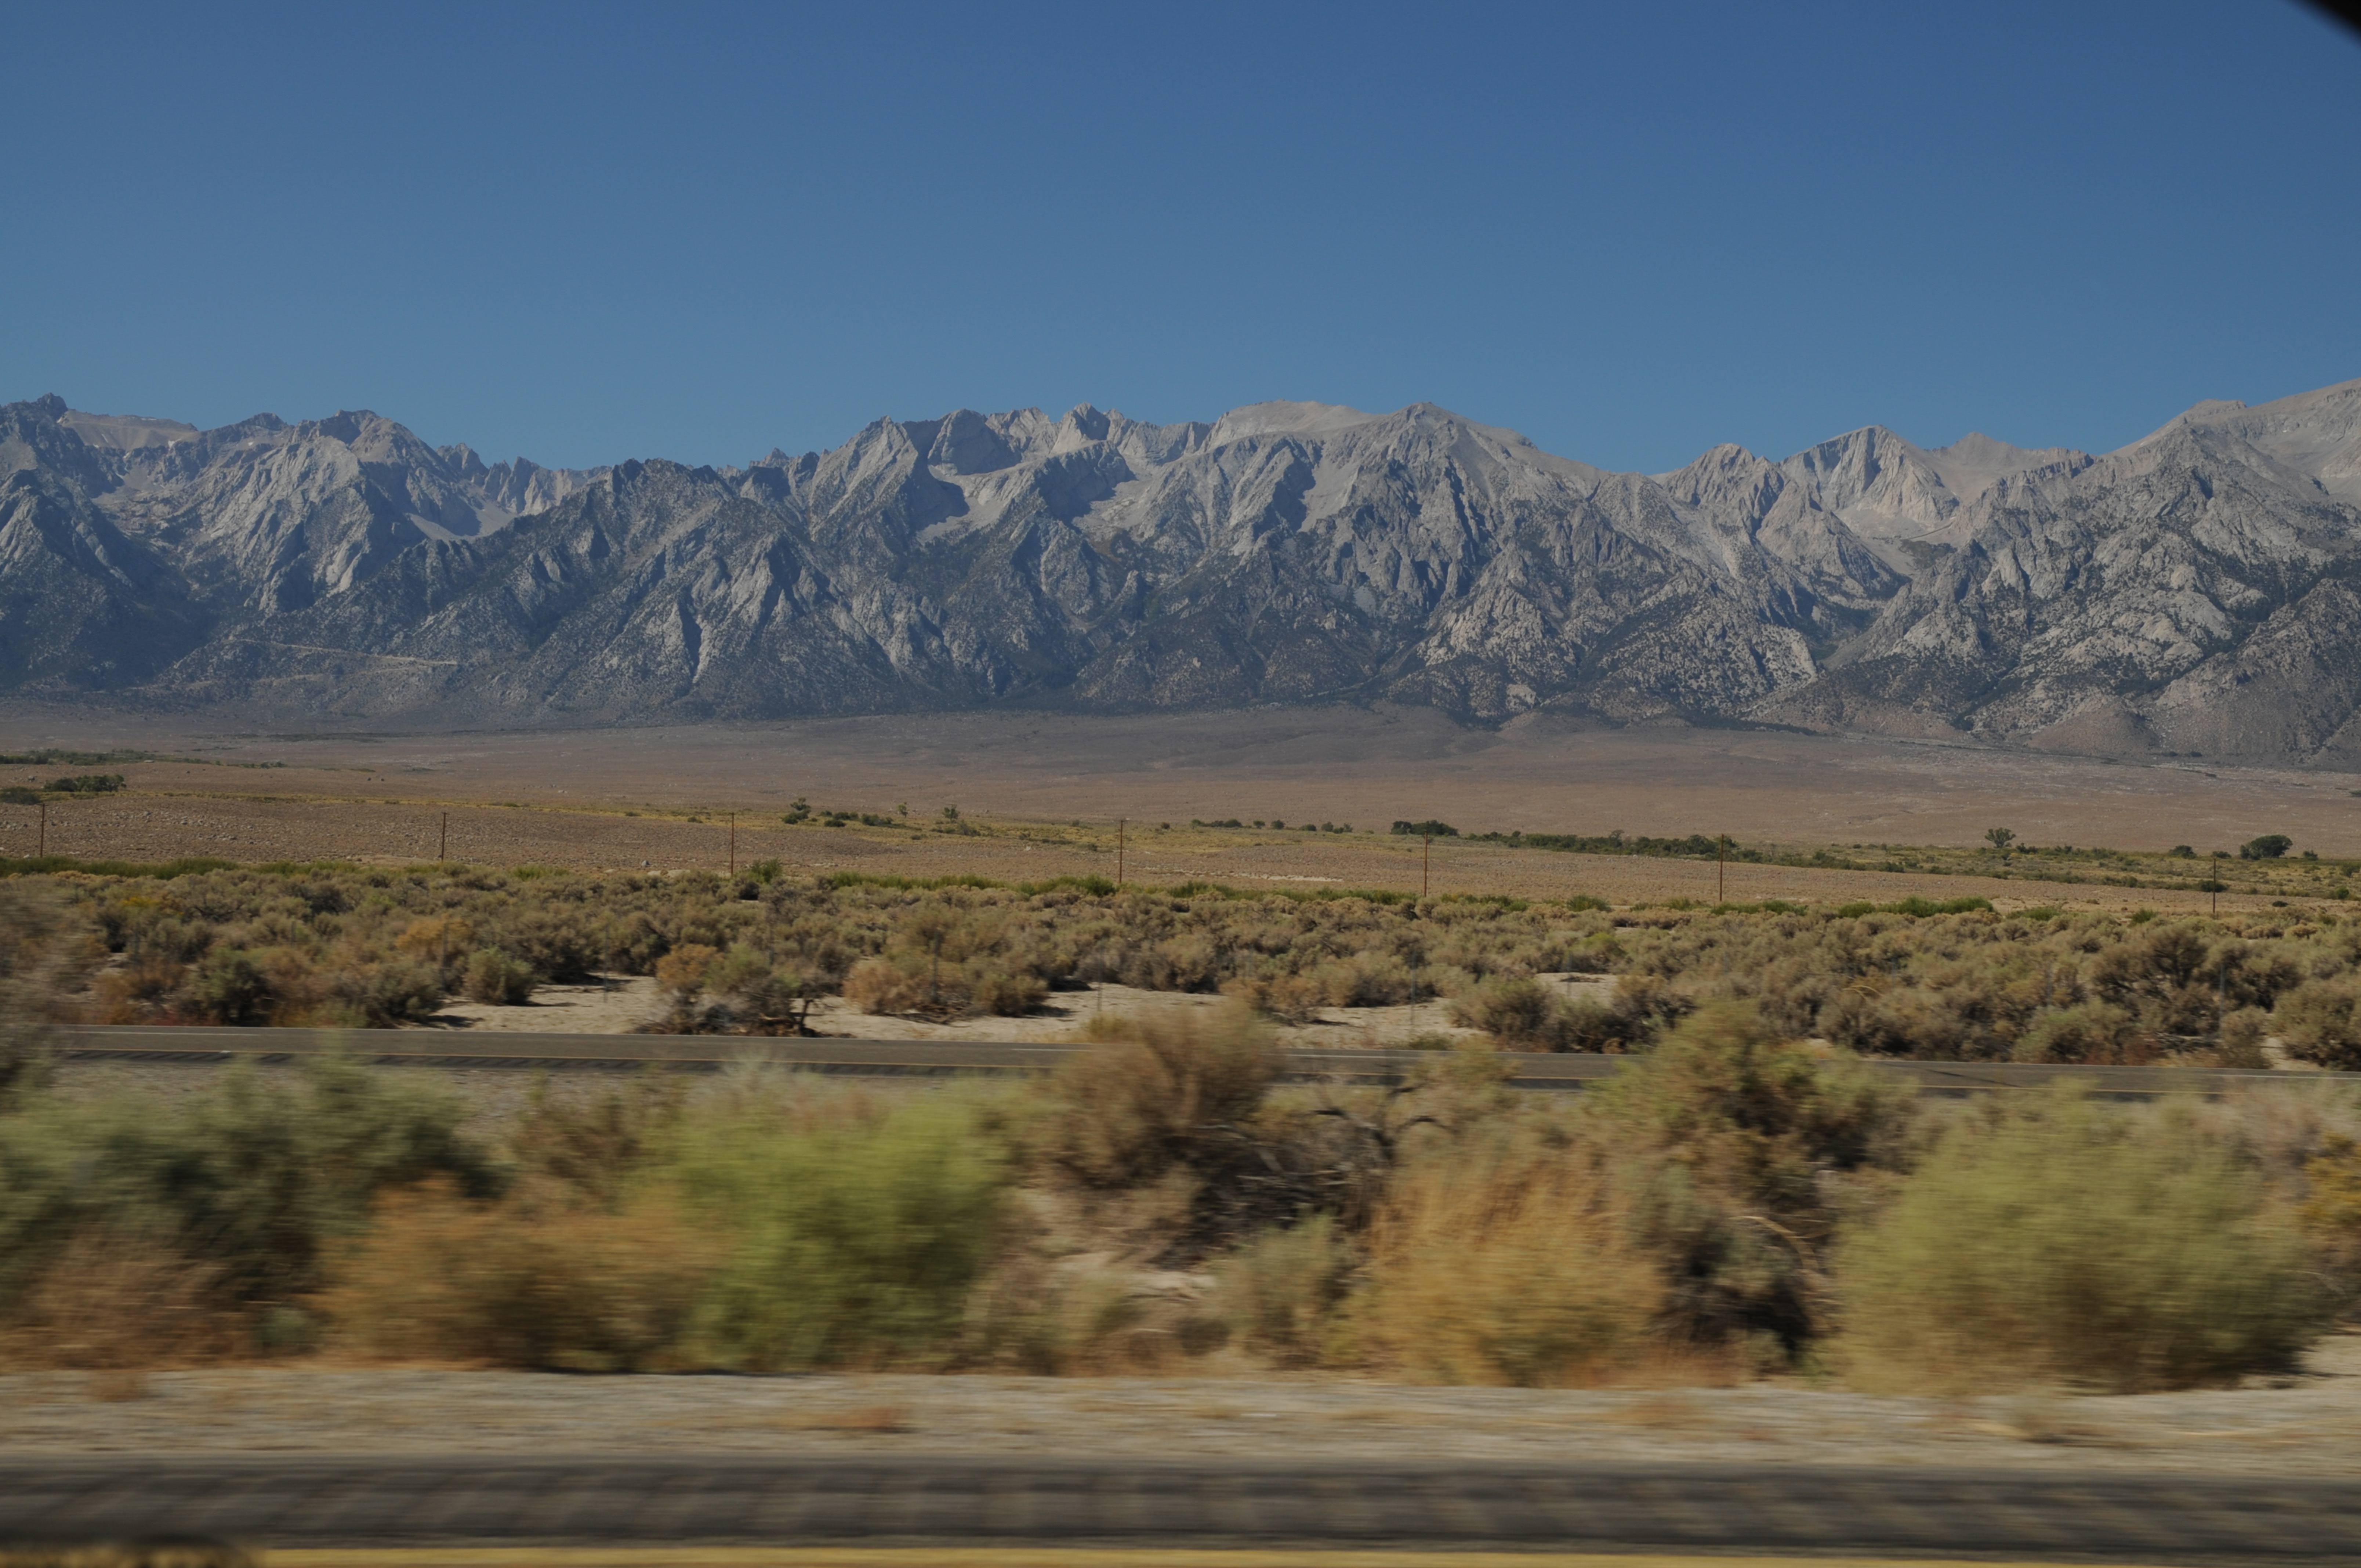 Sierra nevada road side view